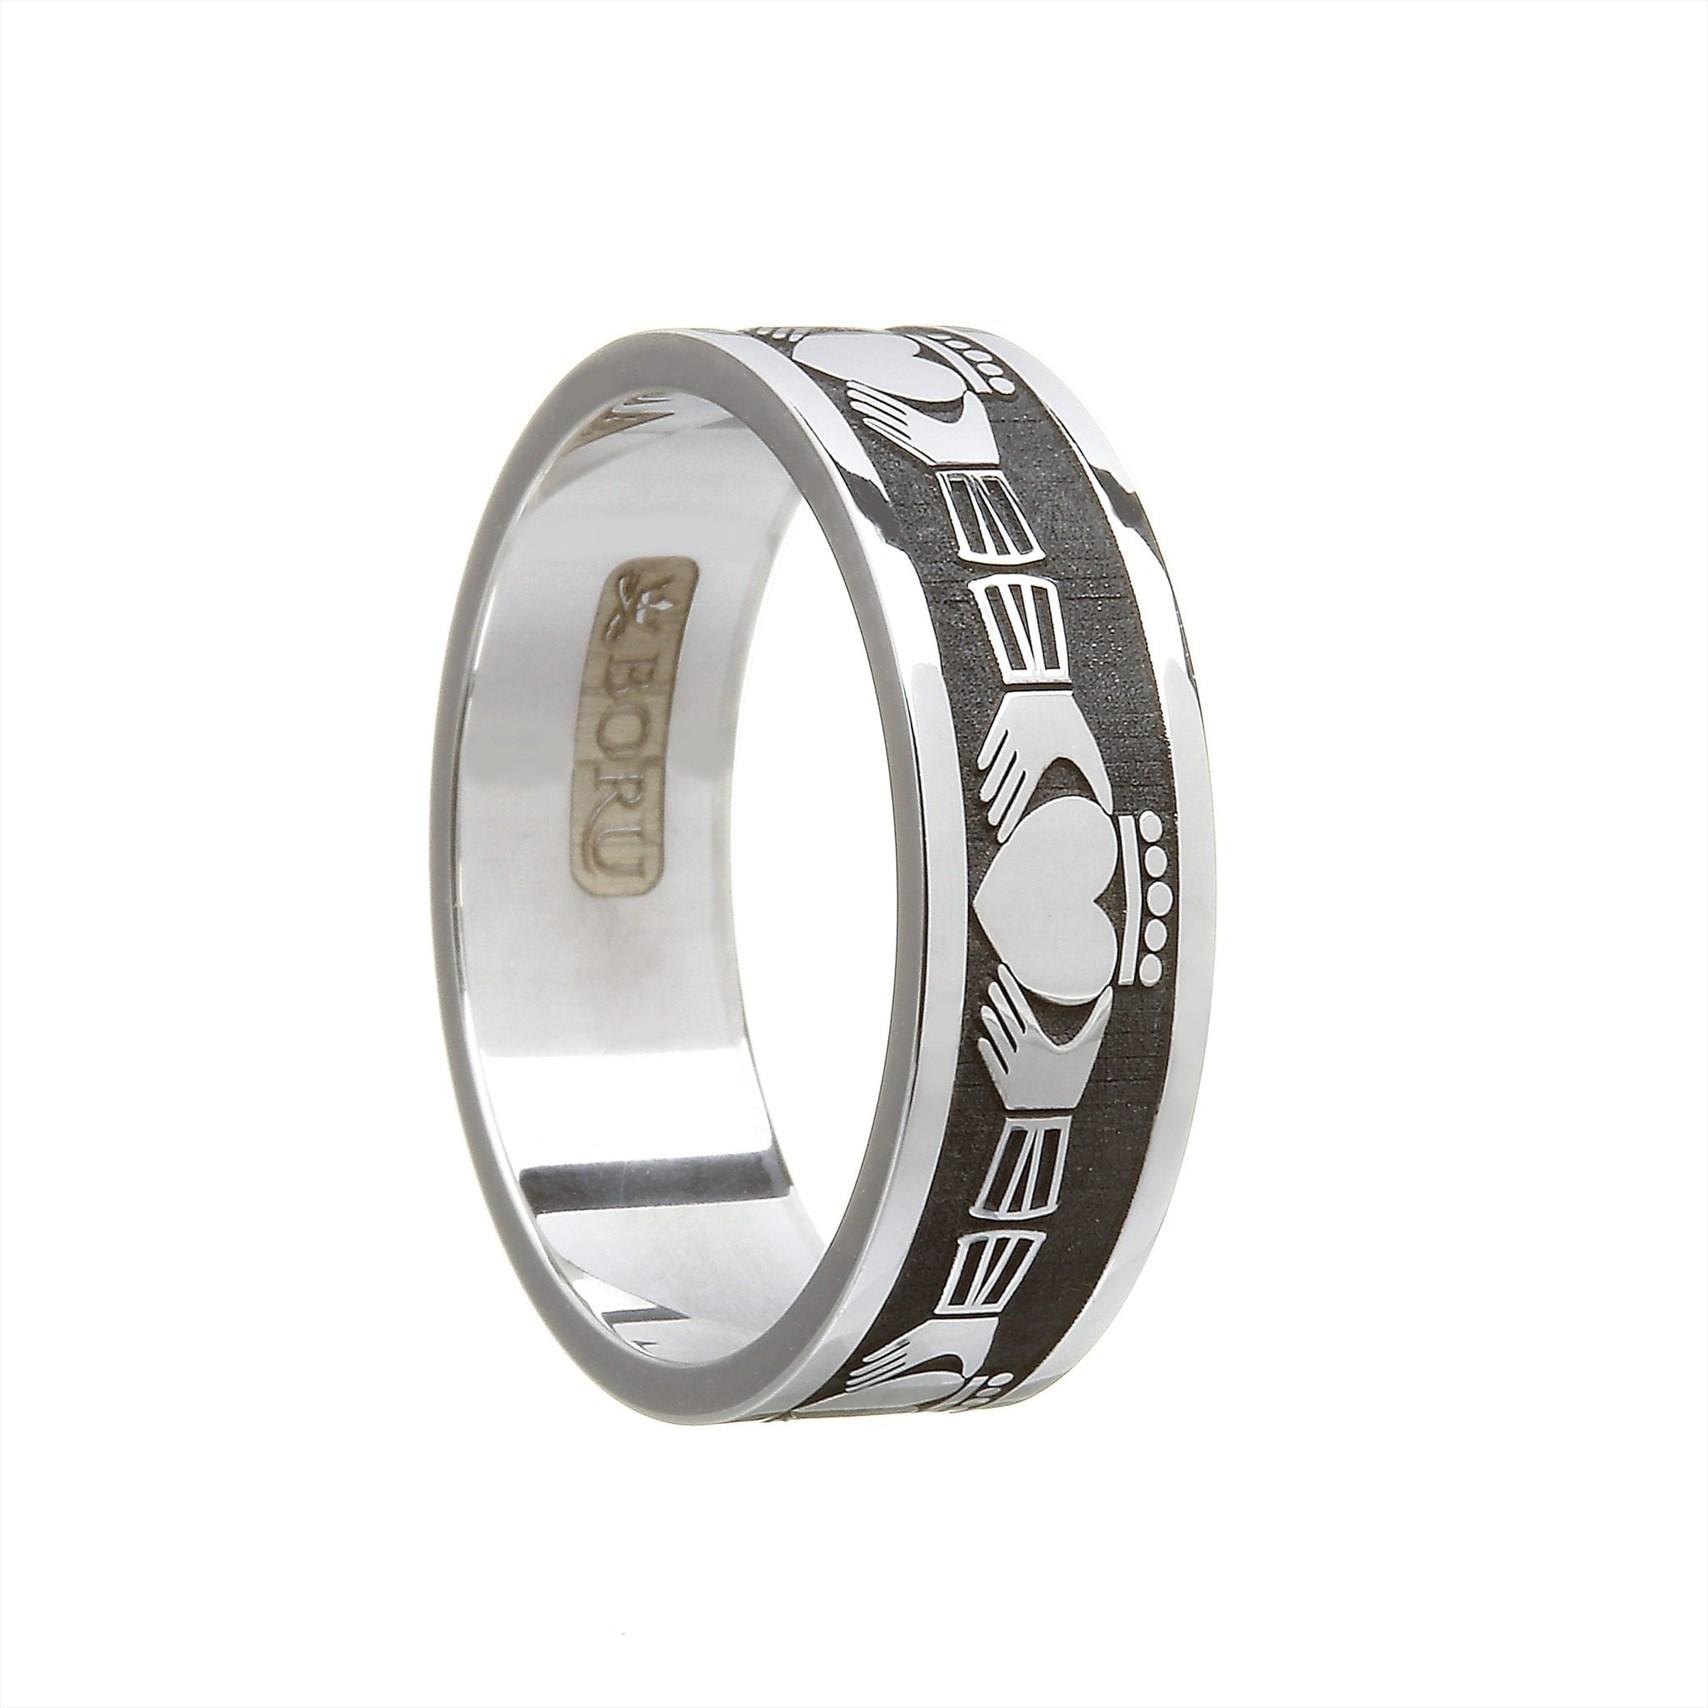 c71d1f43174 Claddagh Wedding Band Gents - The Celtic Shop